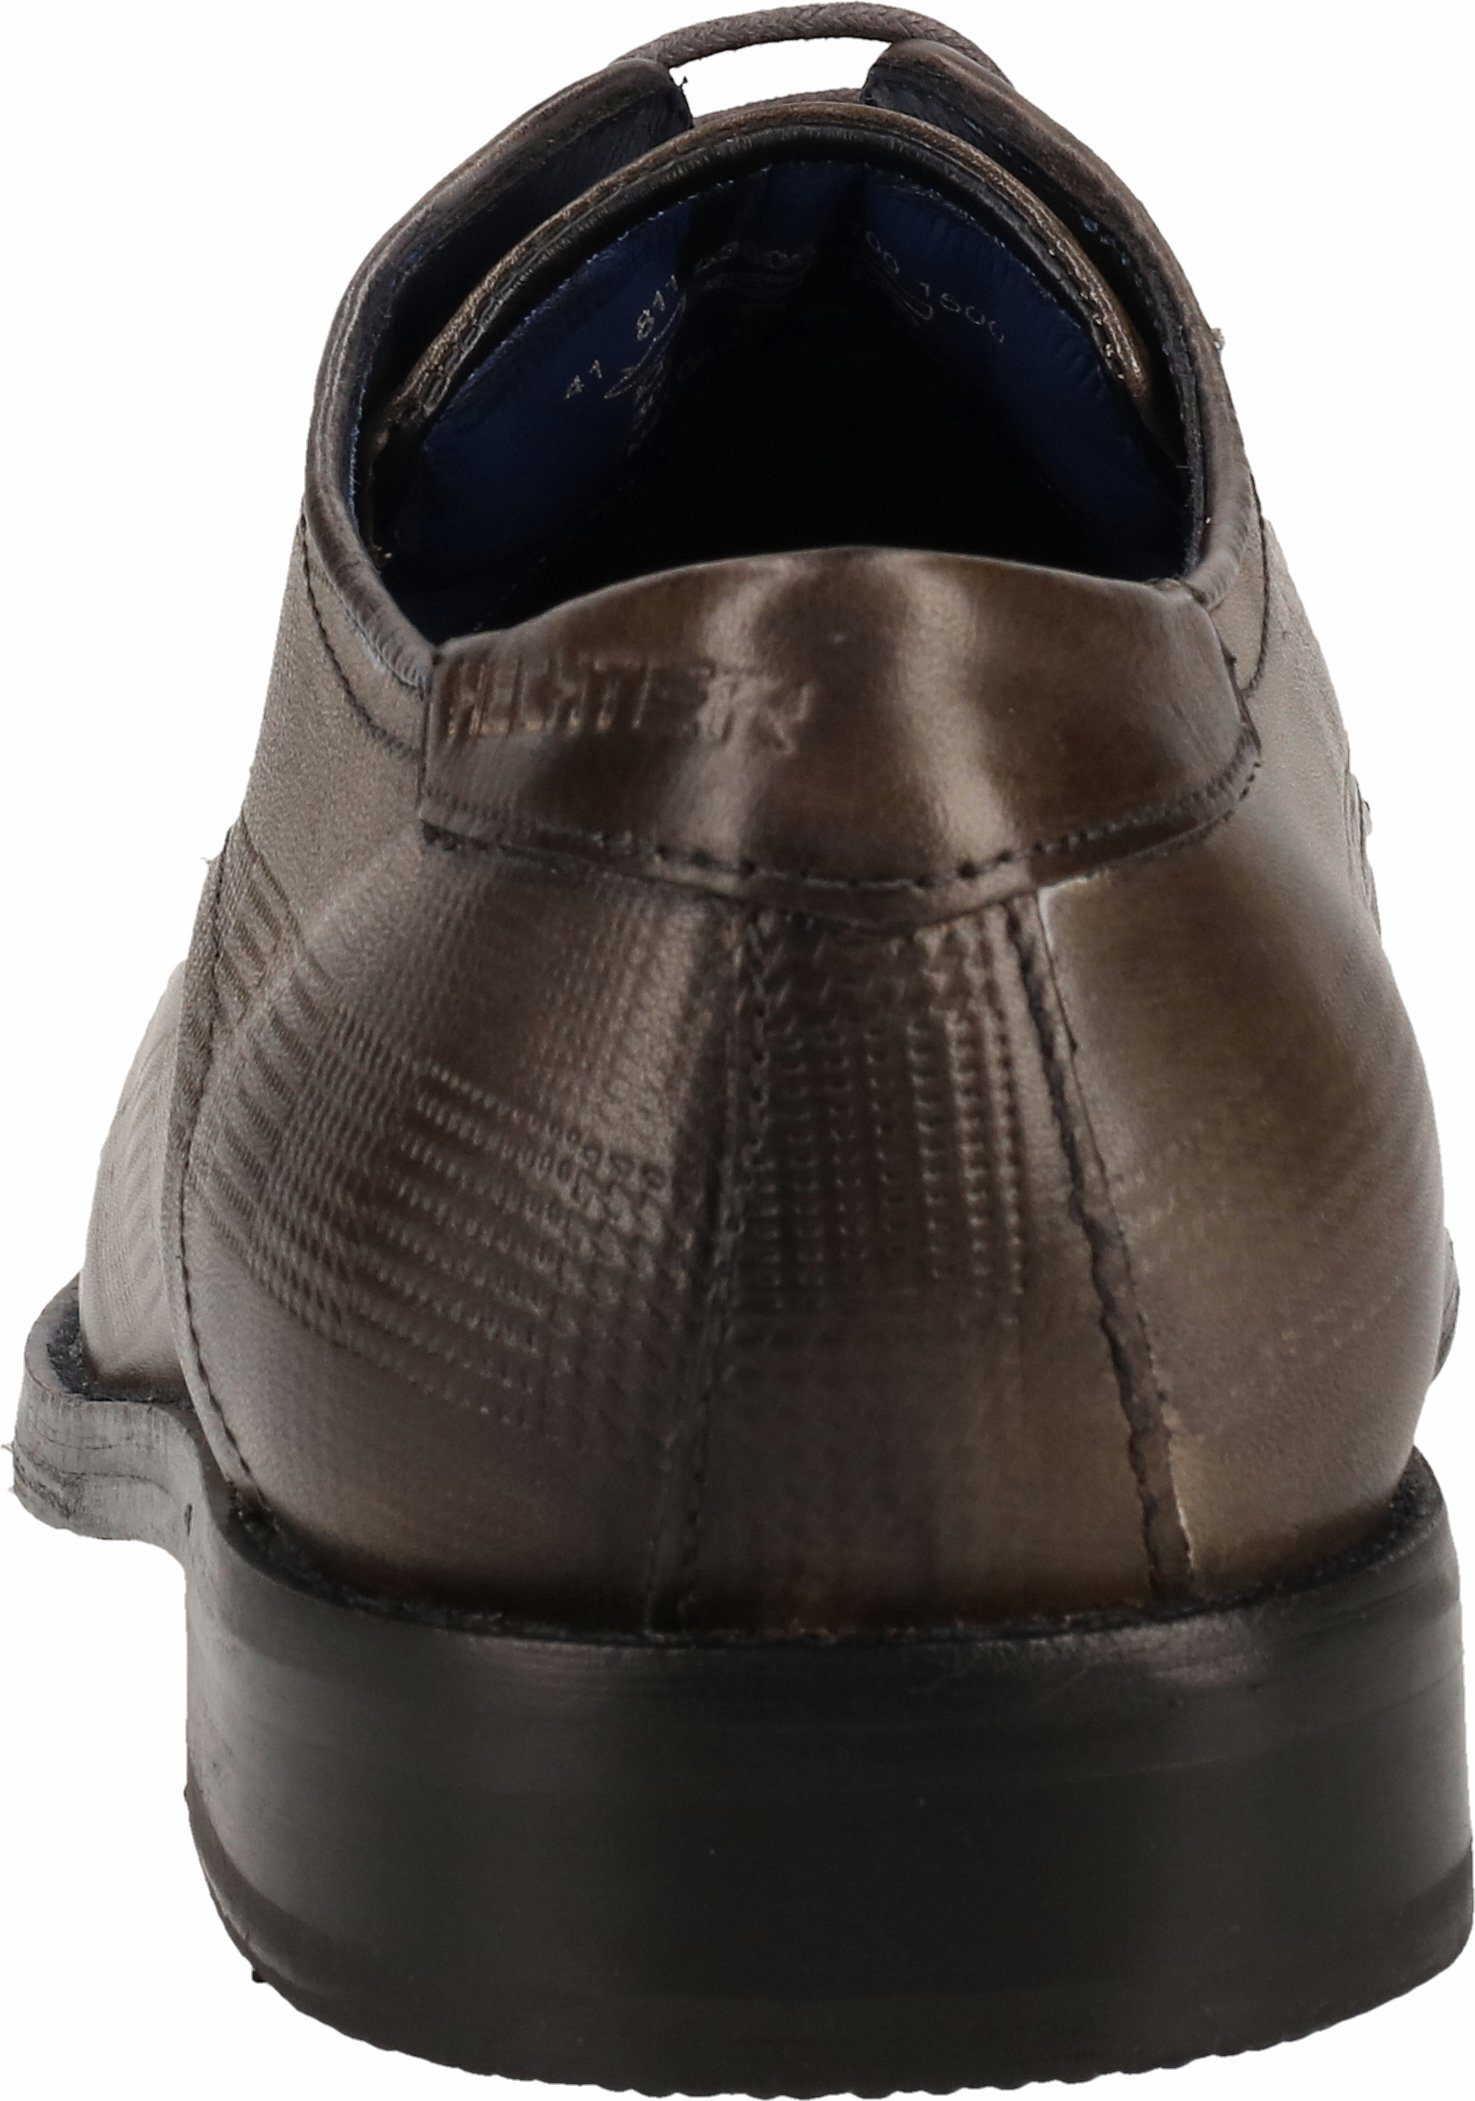 Daniel Hechter Business Schuhe Herrenschuhe 811536061100-1500 Grau | Herrenschuhe 5i0uf